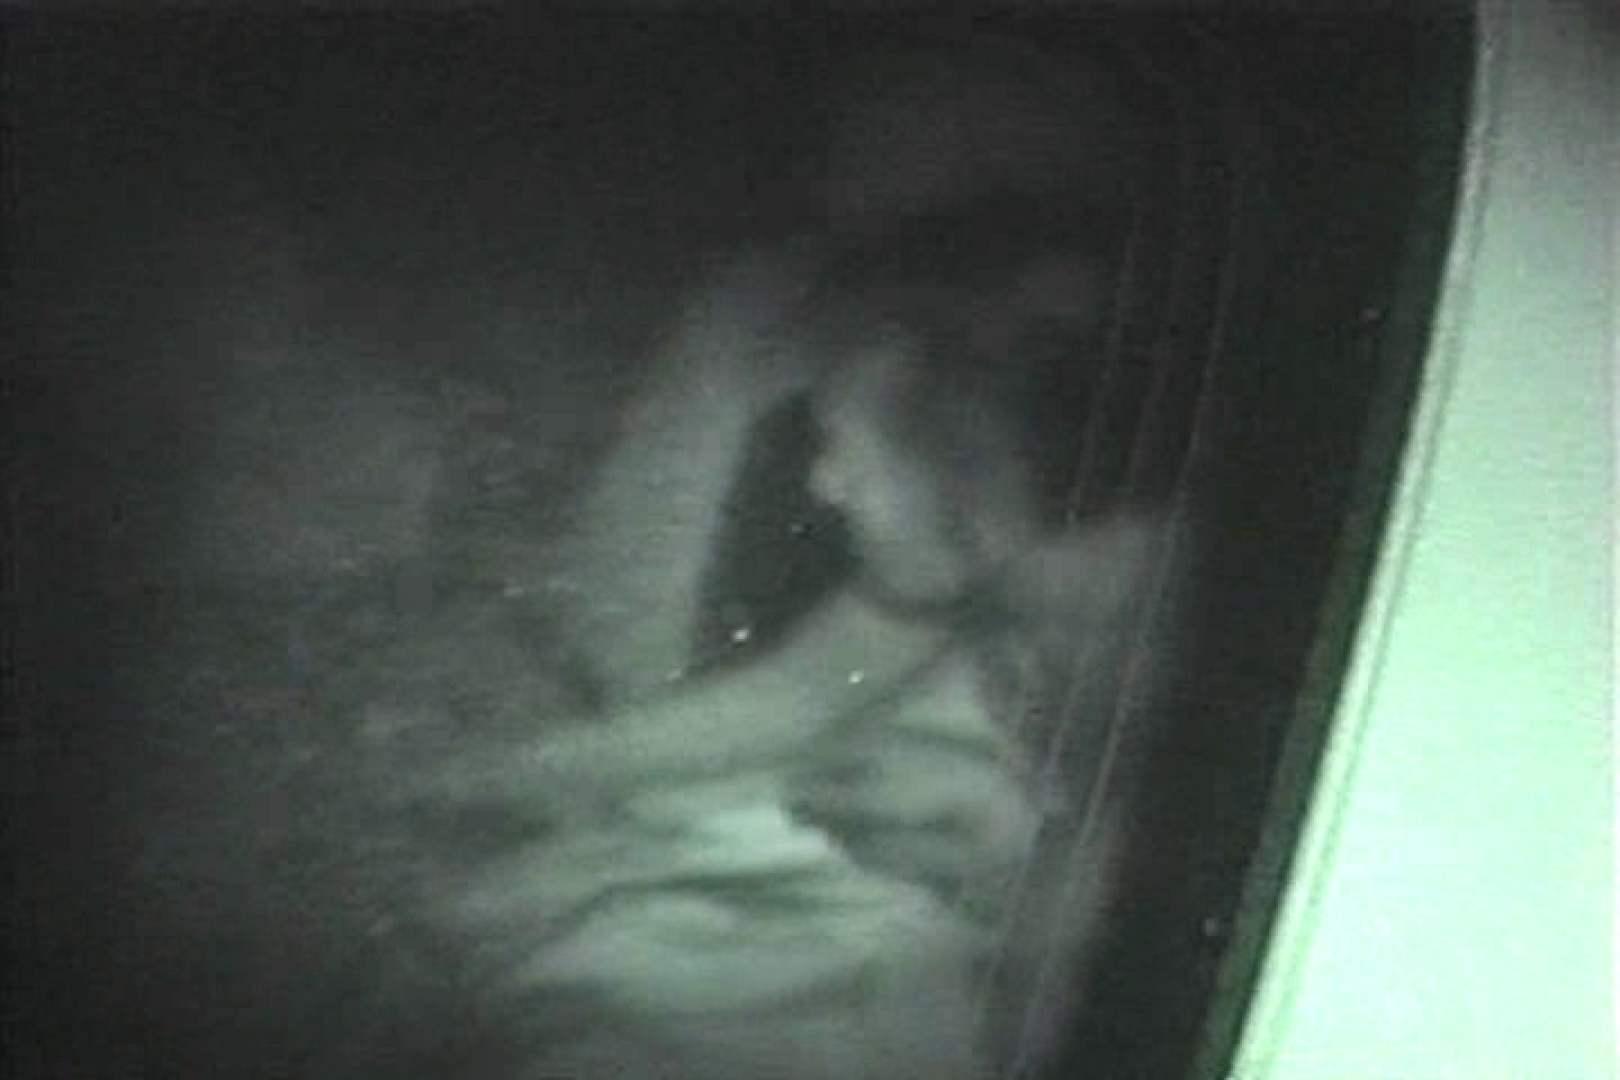 MASAさんの待ち伏せ撮り! 赤外線カーセックスVol.11 OLセックス 盗撮セックス無修正動画無料 81画像 20